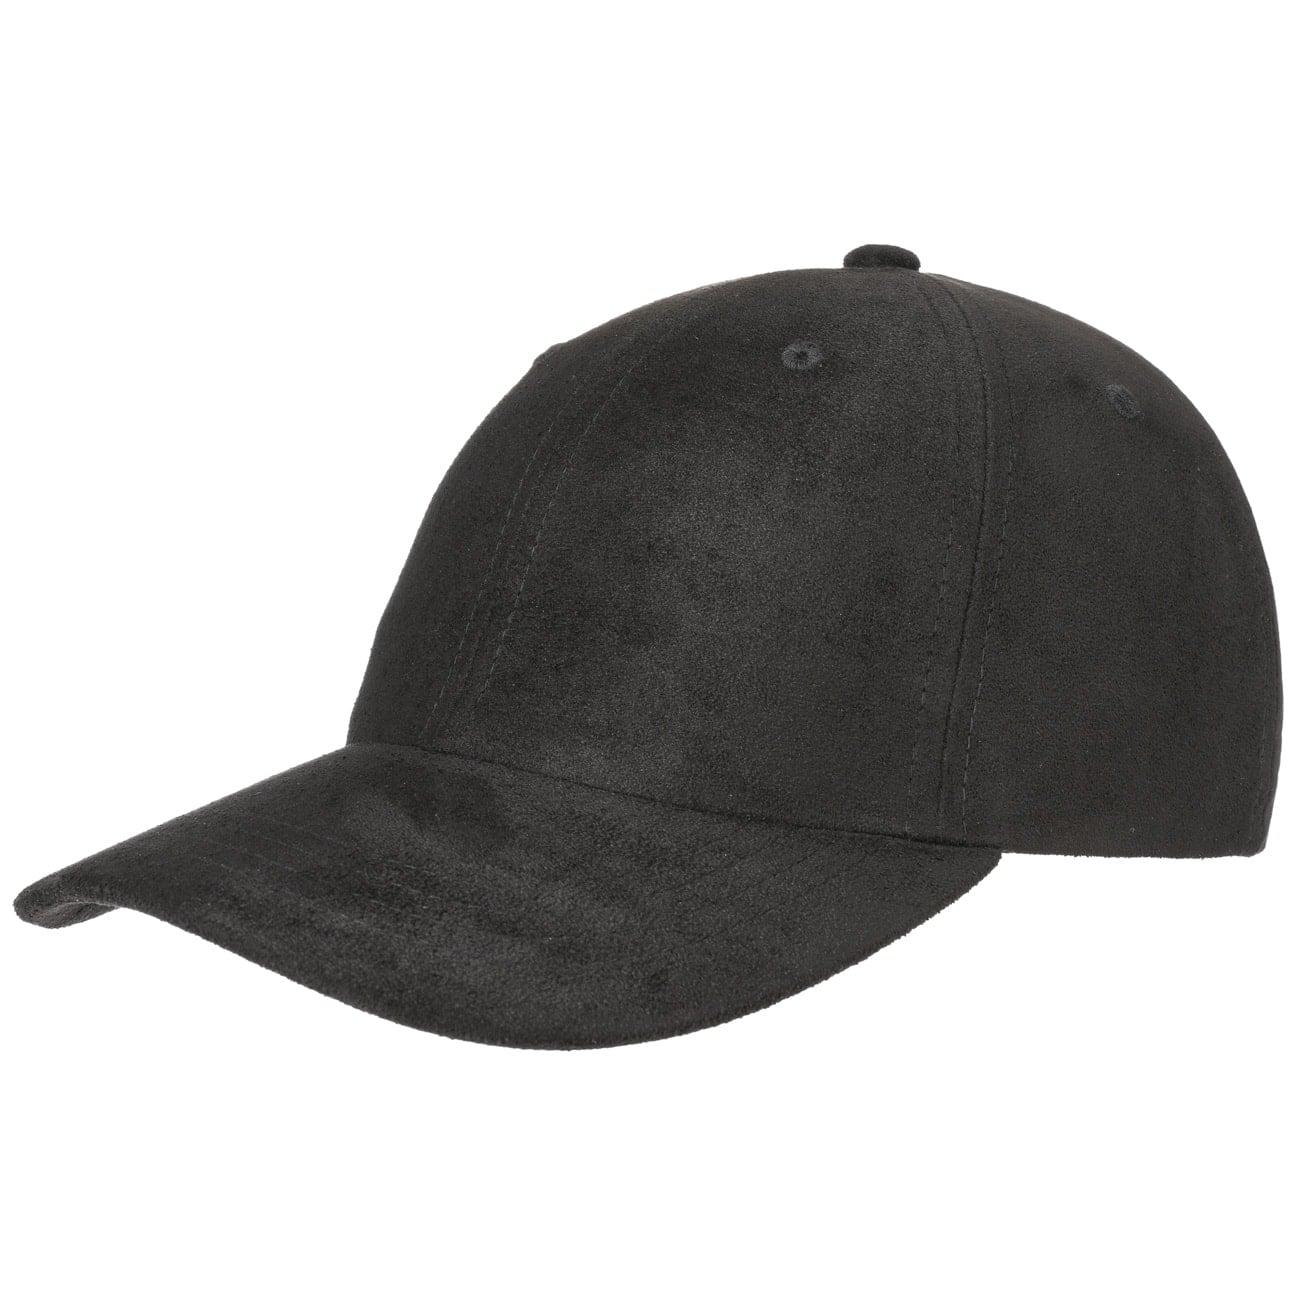 Casquette Low Profile Velours Strapback  baseball cap